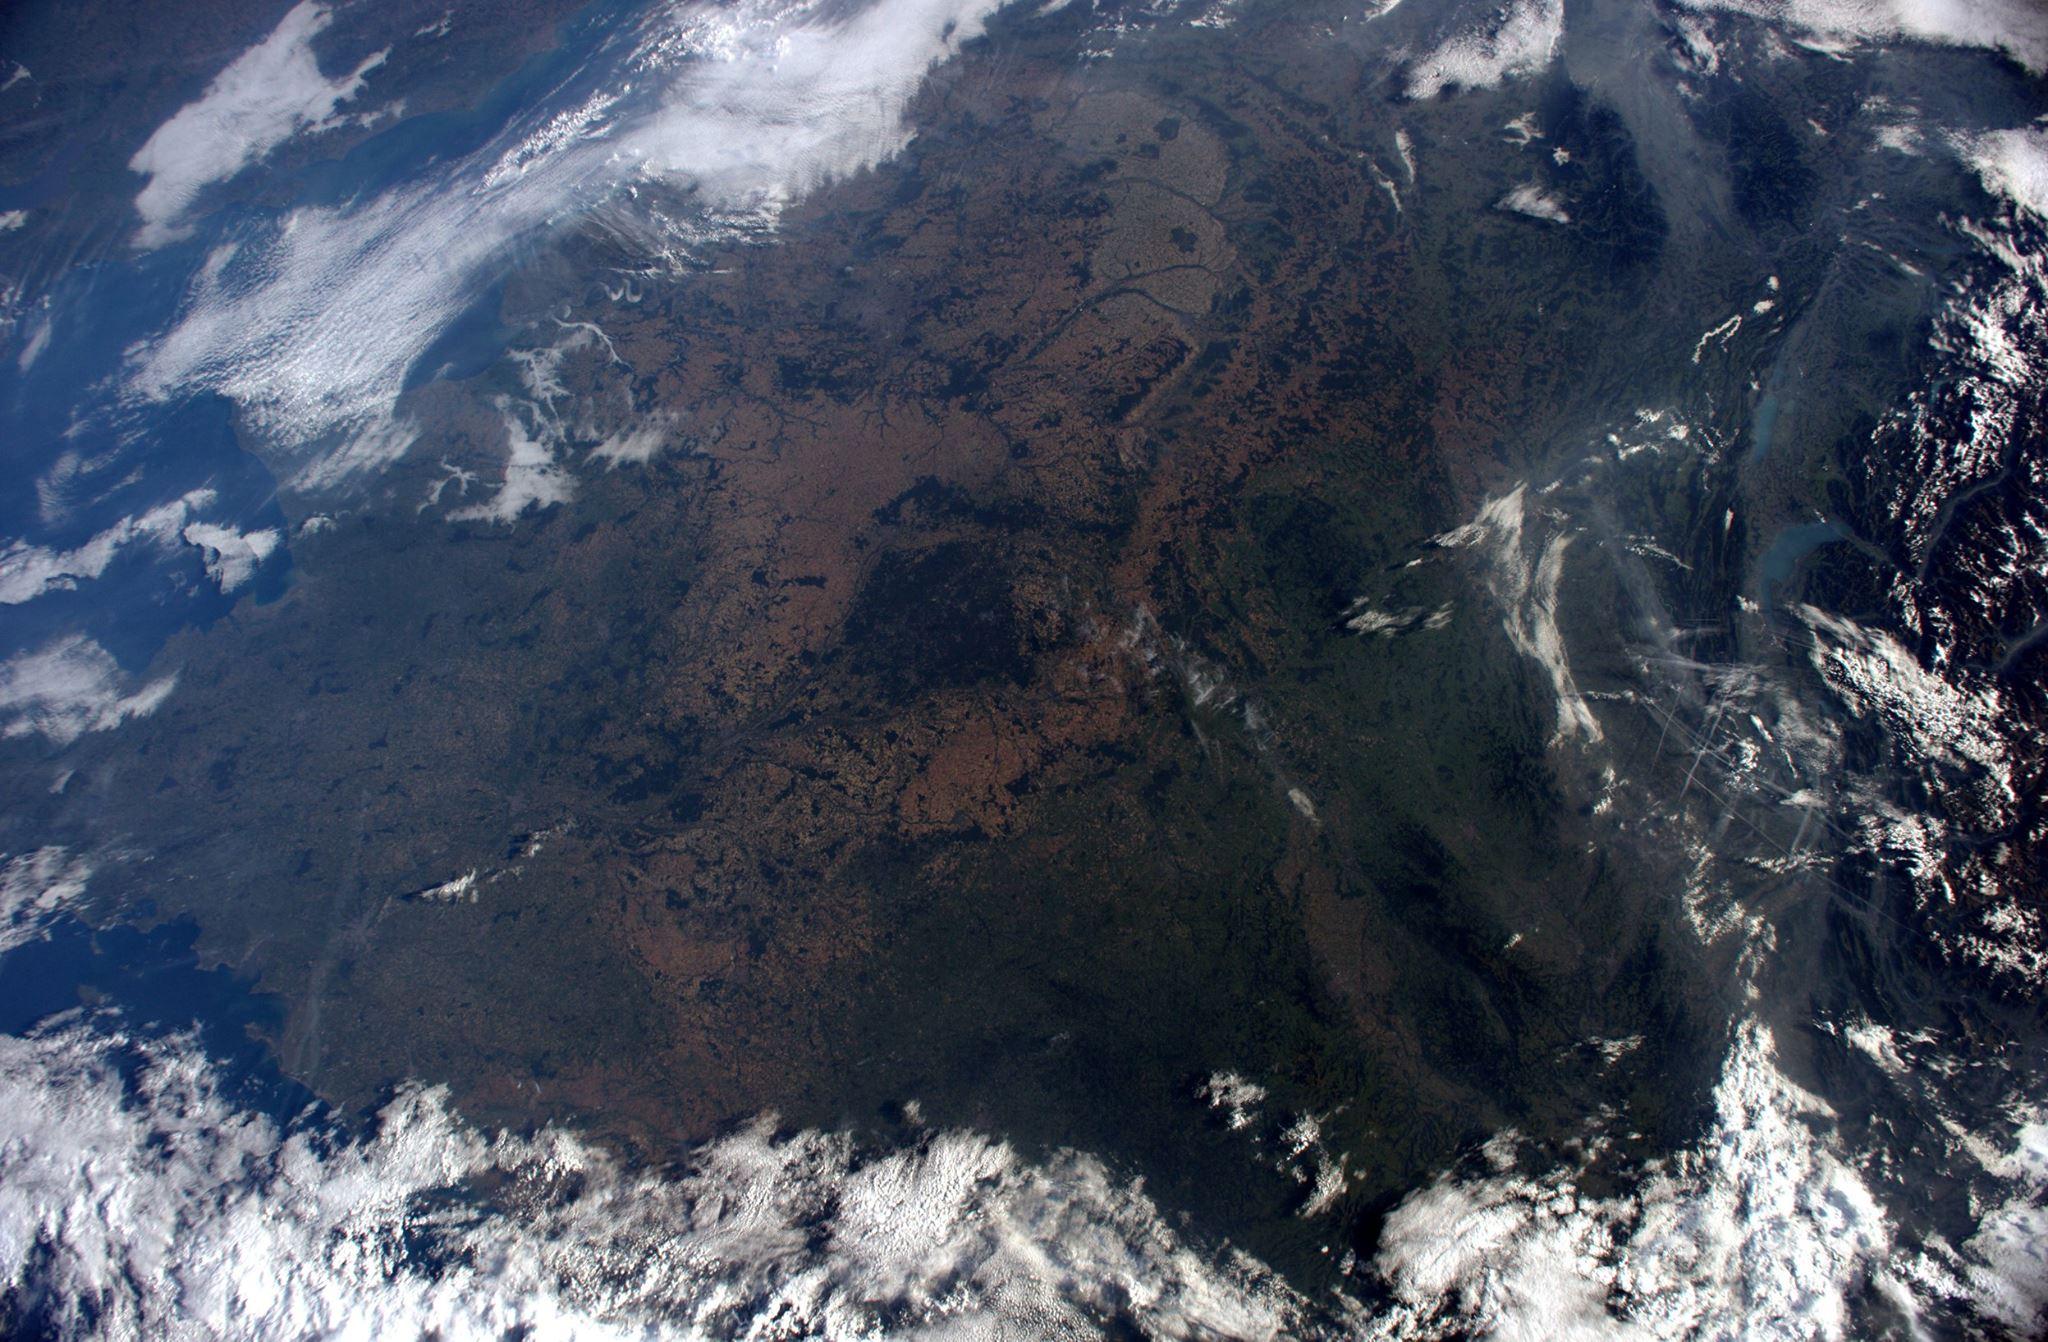 Photos astronaut Alexander Gerst 27